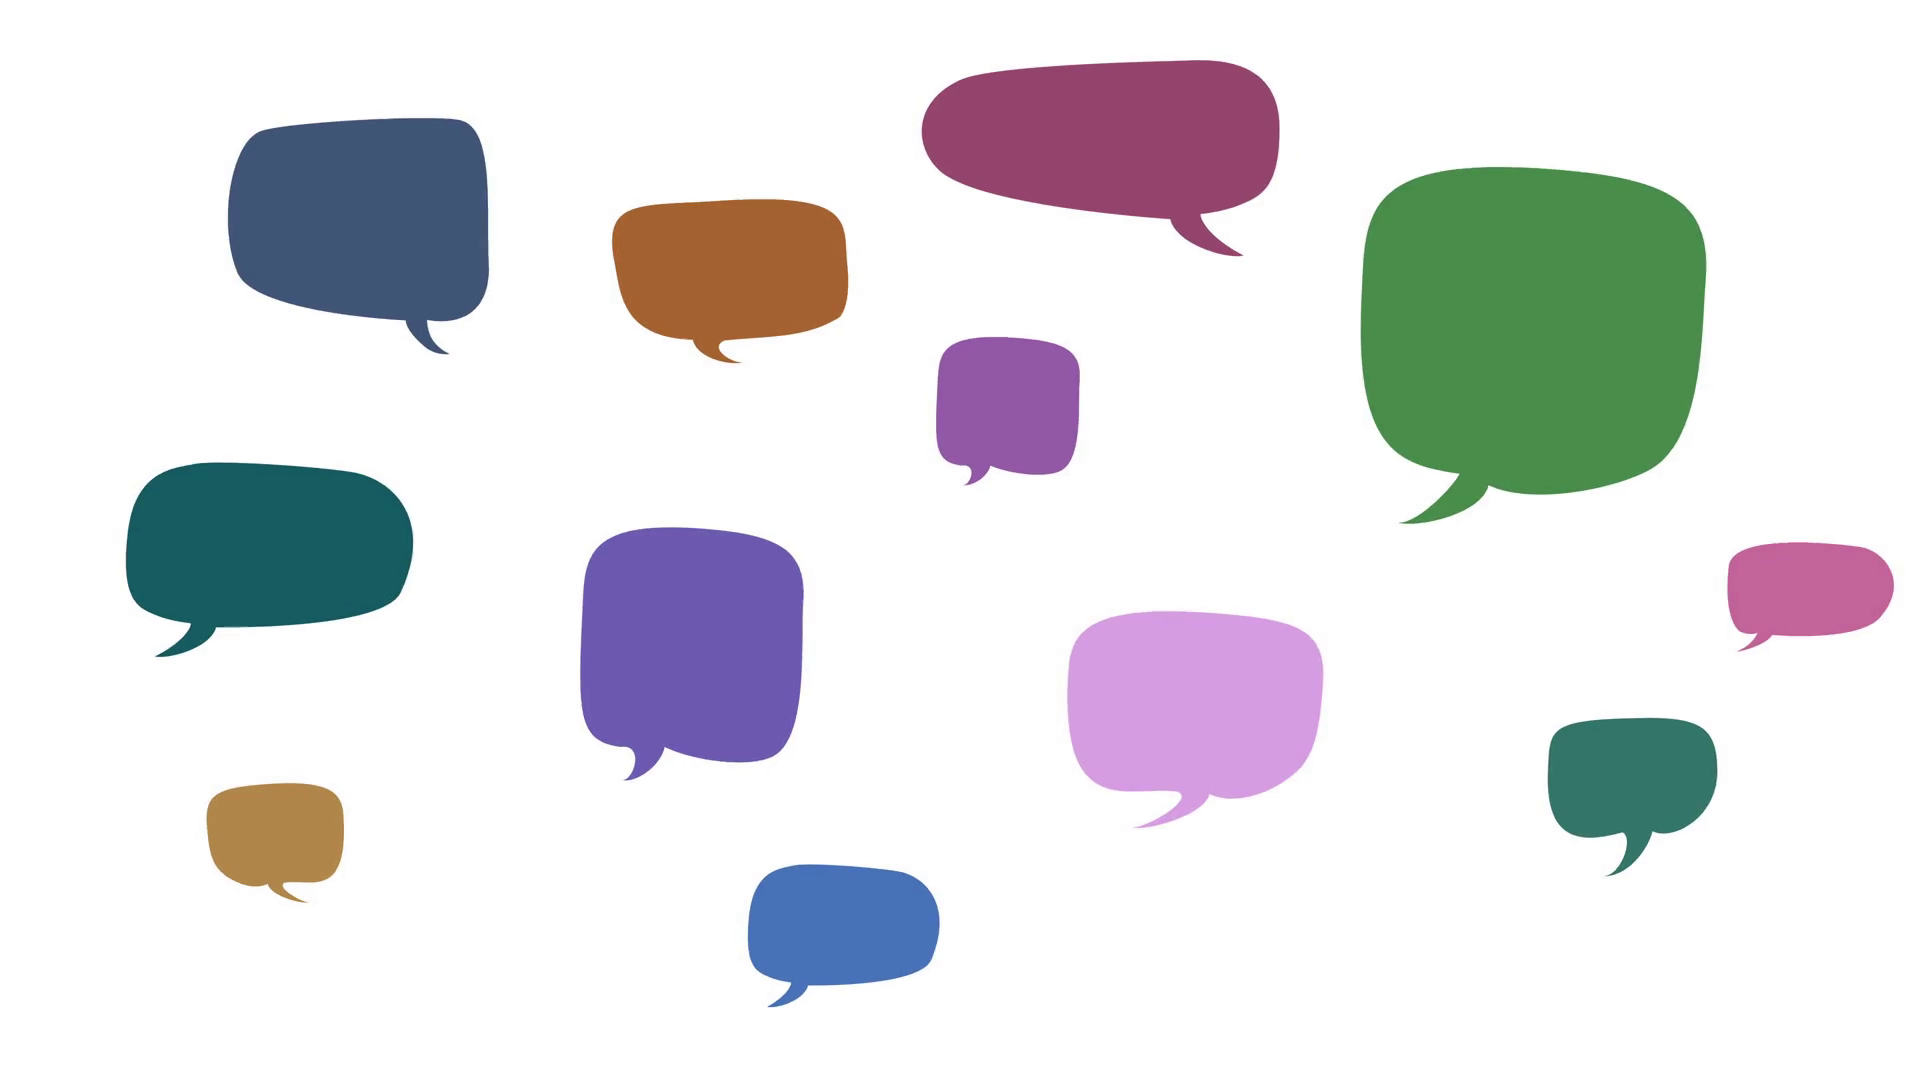 Block clipart blank block. Animated speech bubbles on